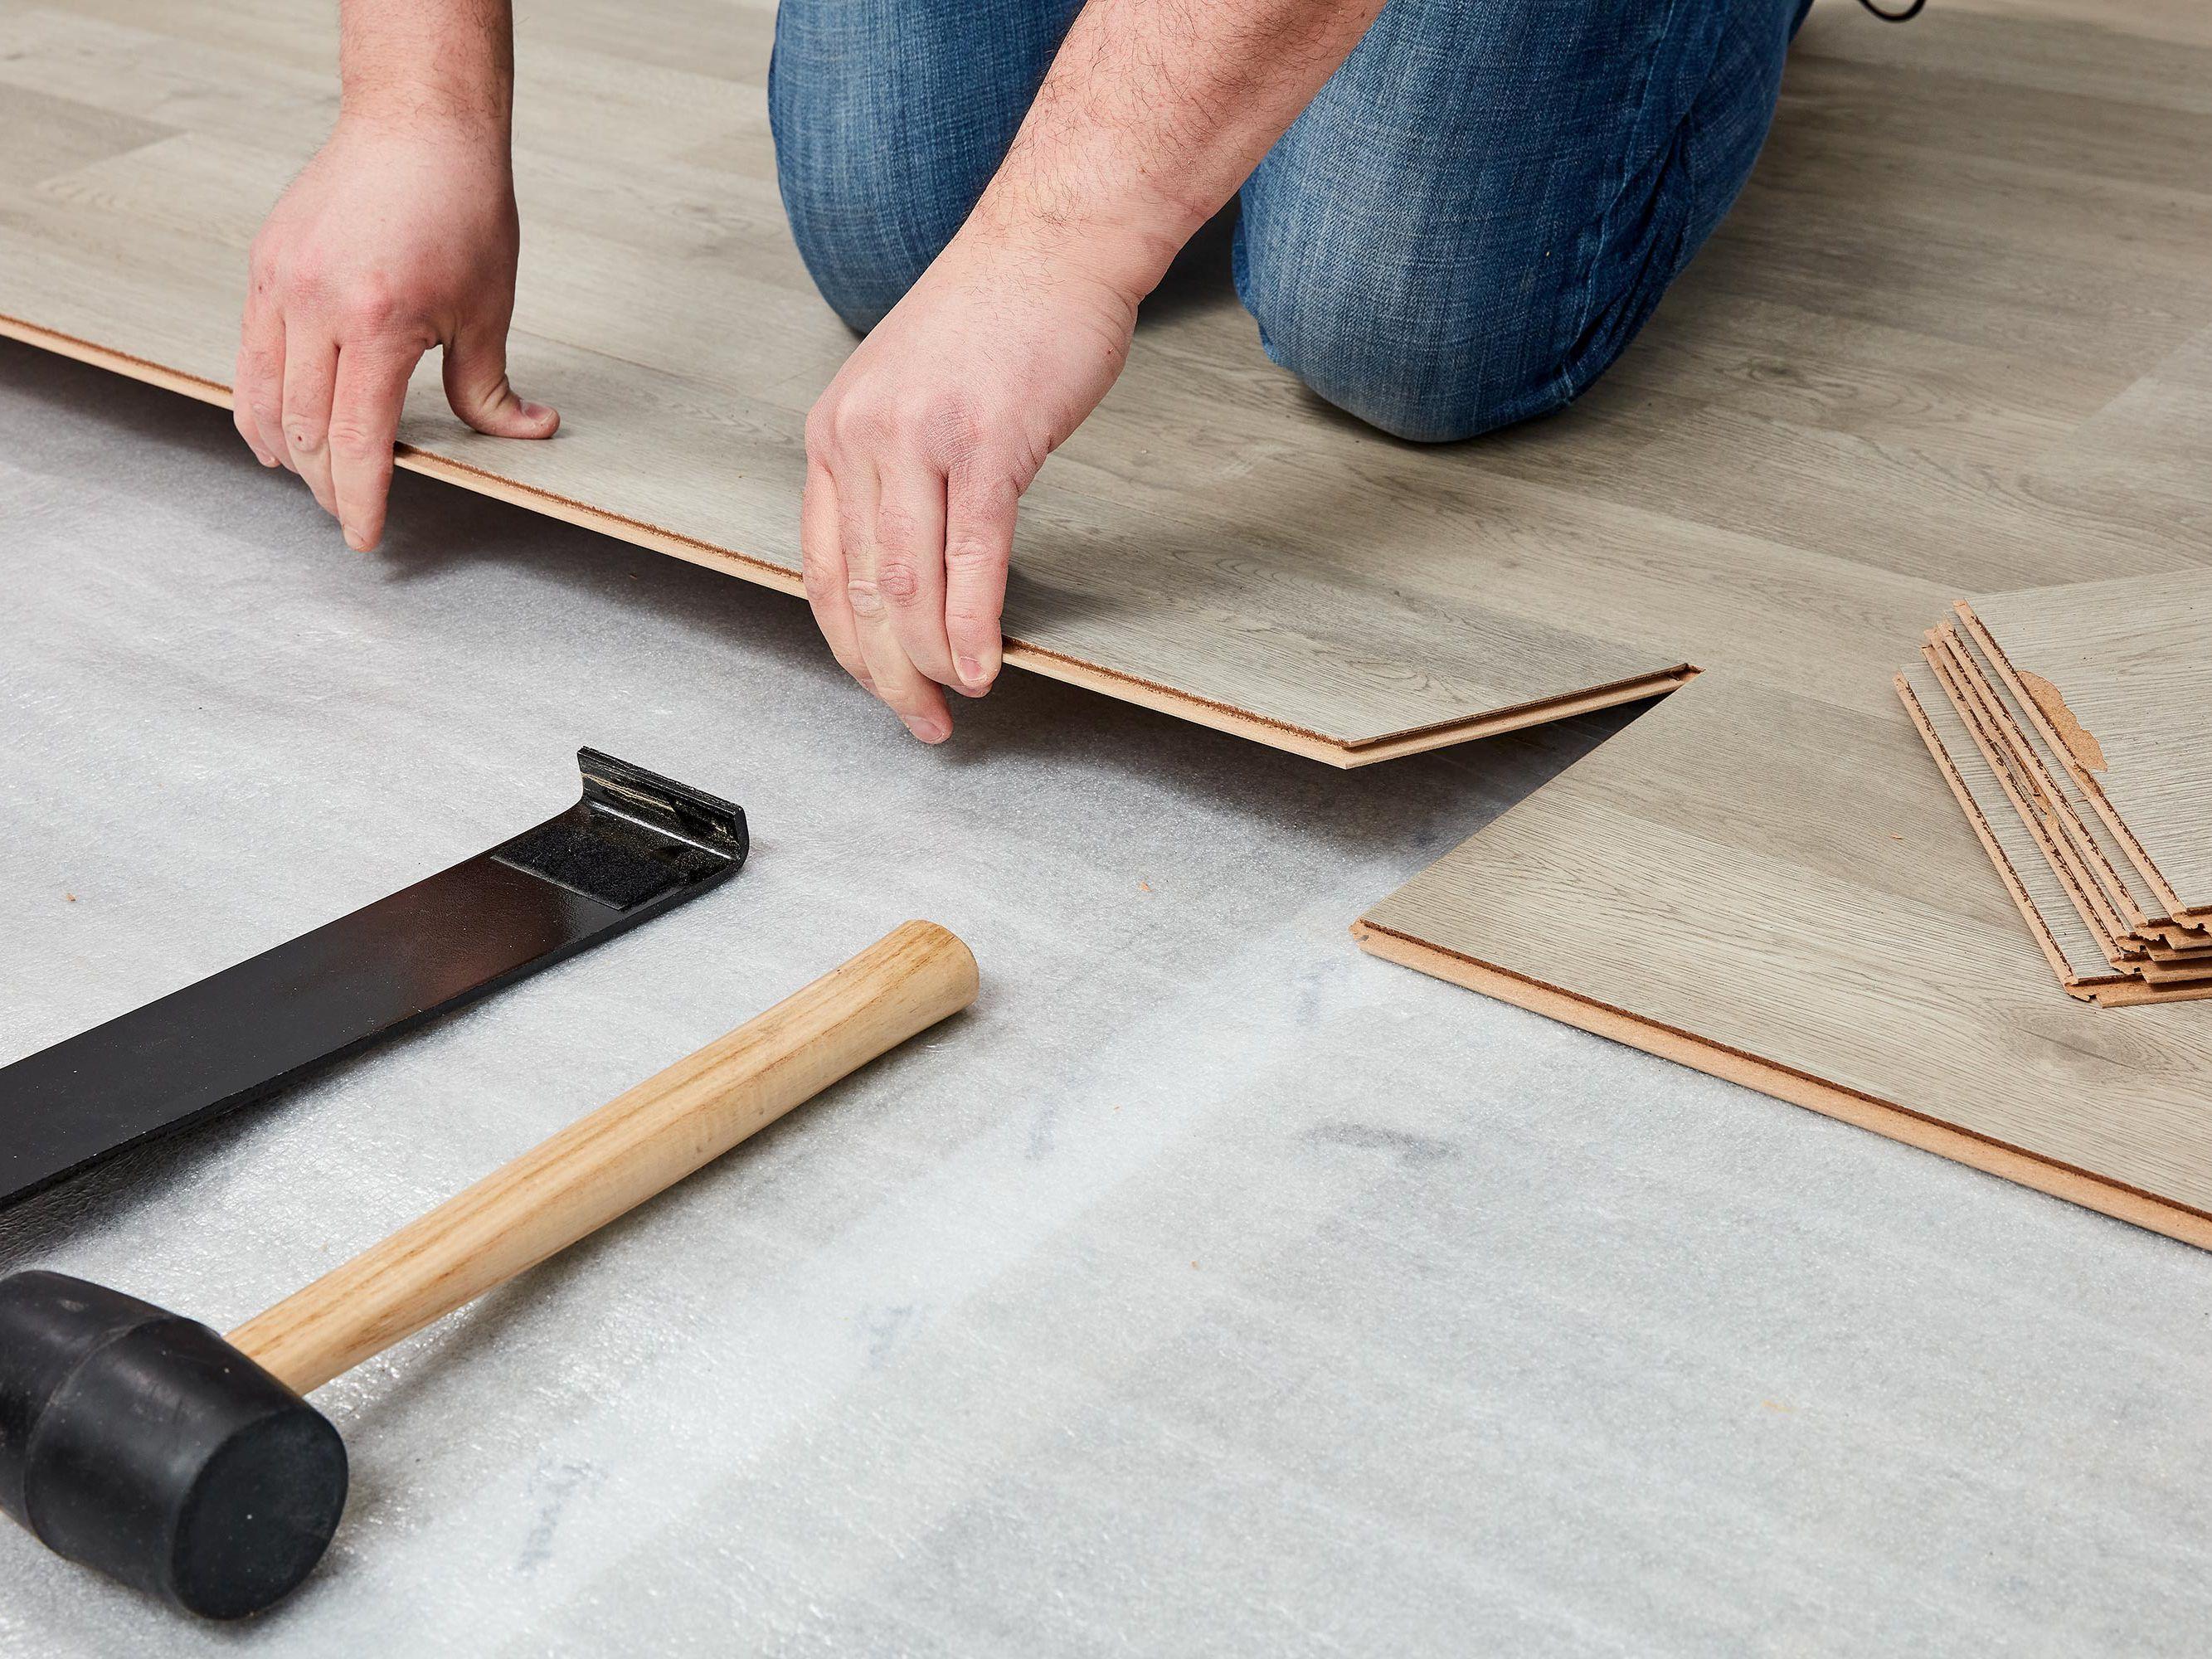 Laminate Underlayment Installation Basics, Is It Necessary To Use Underlay For Laminate Flooring